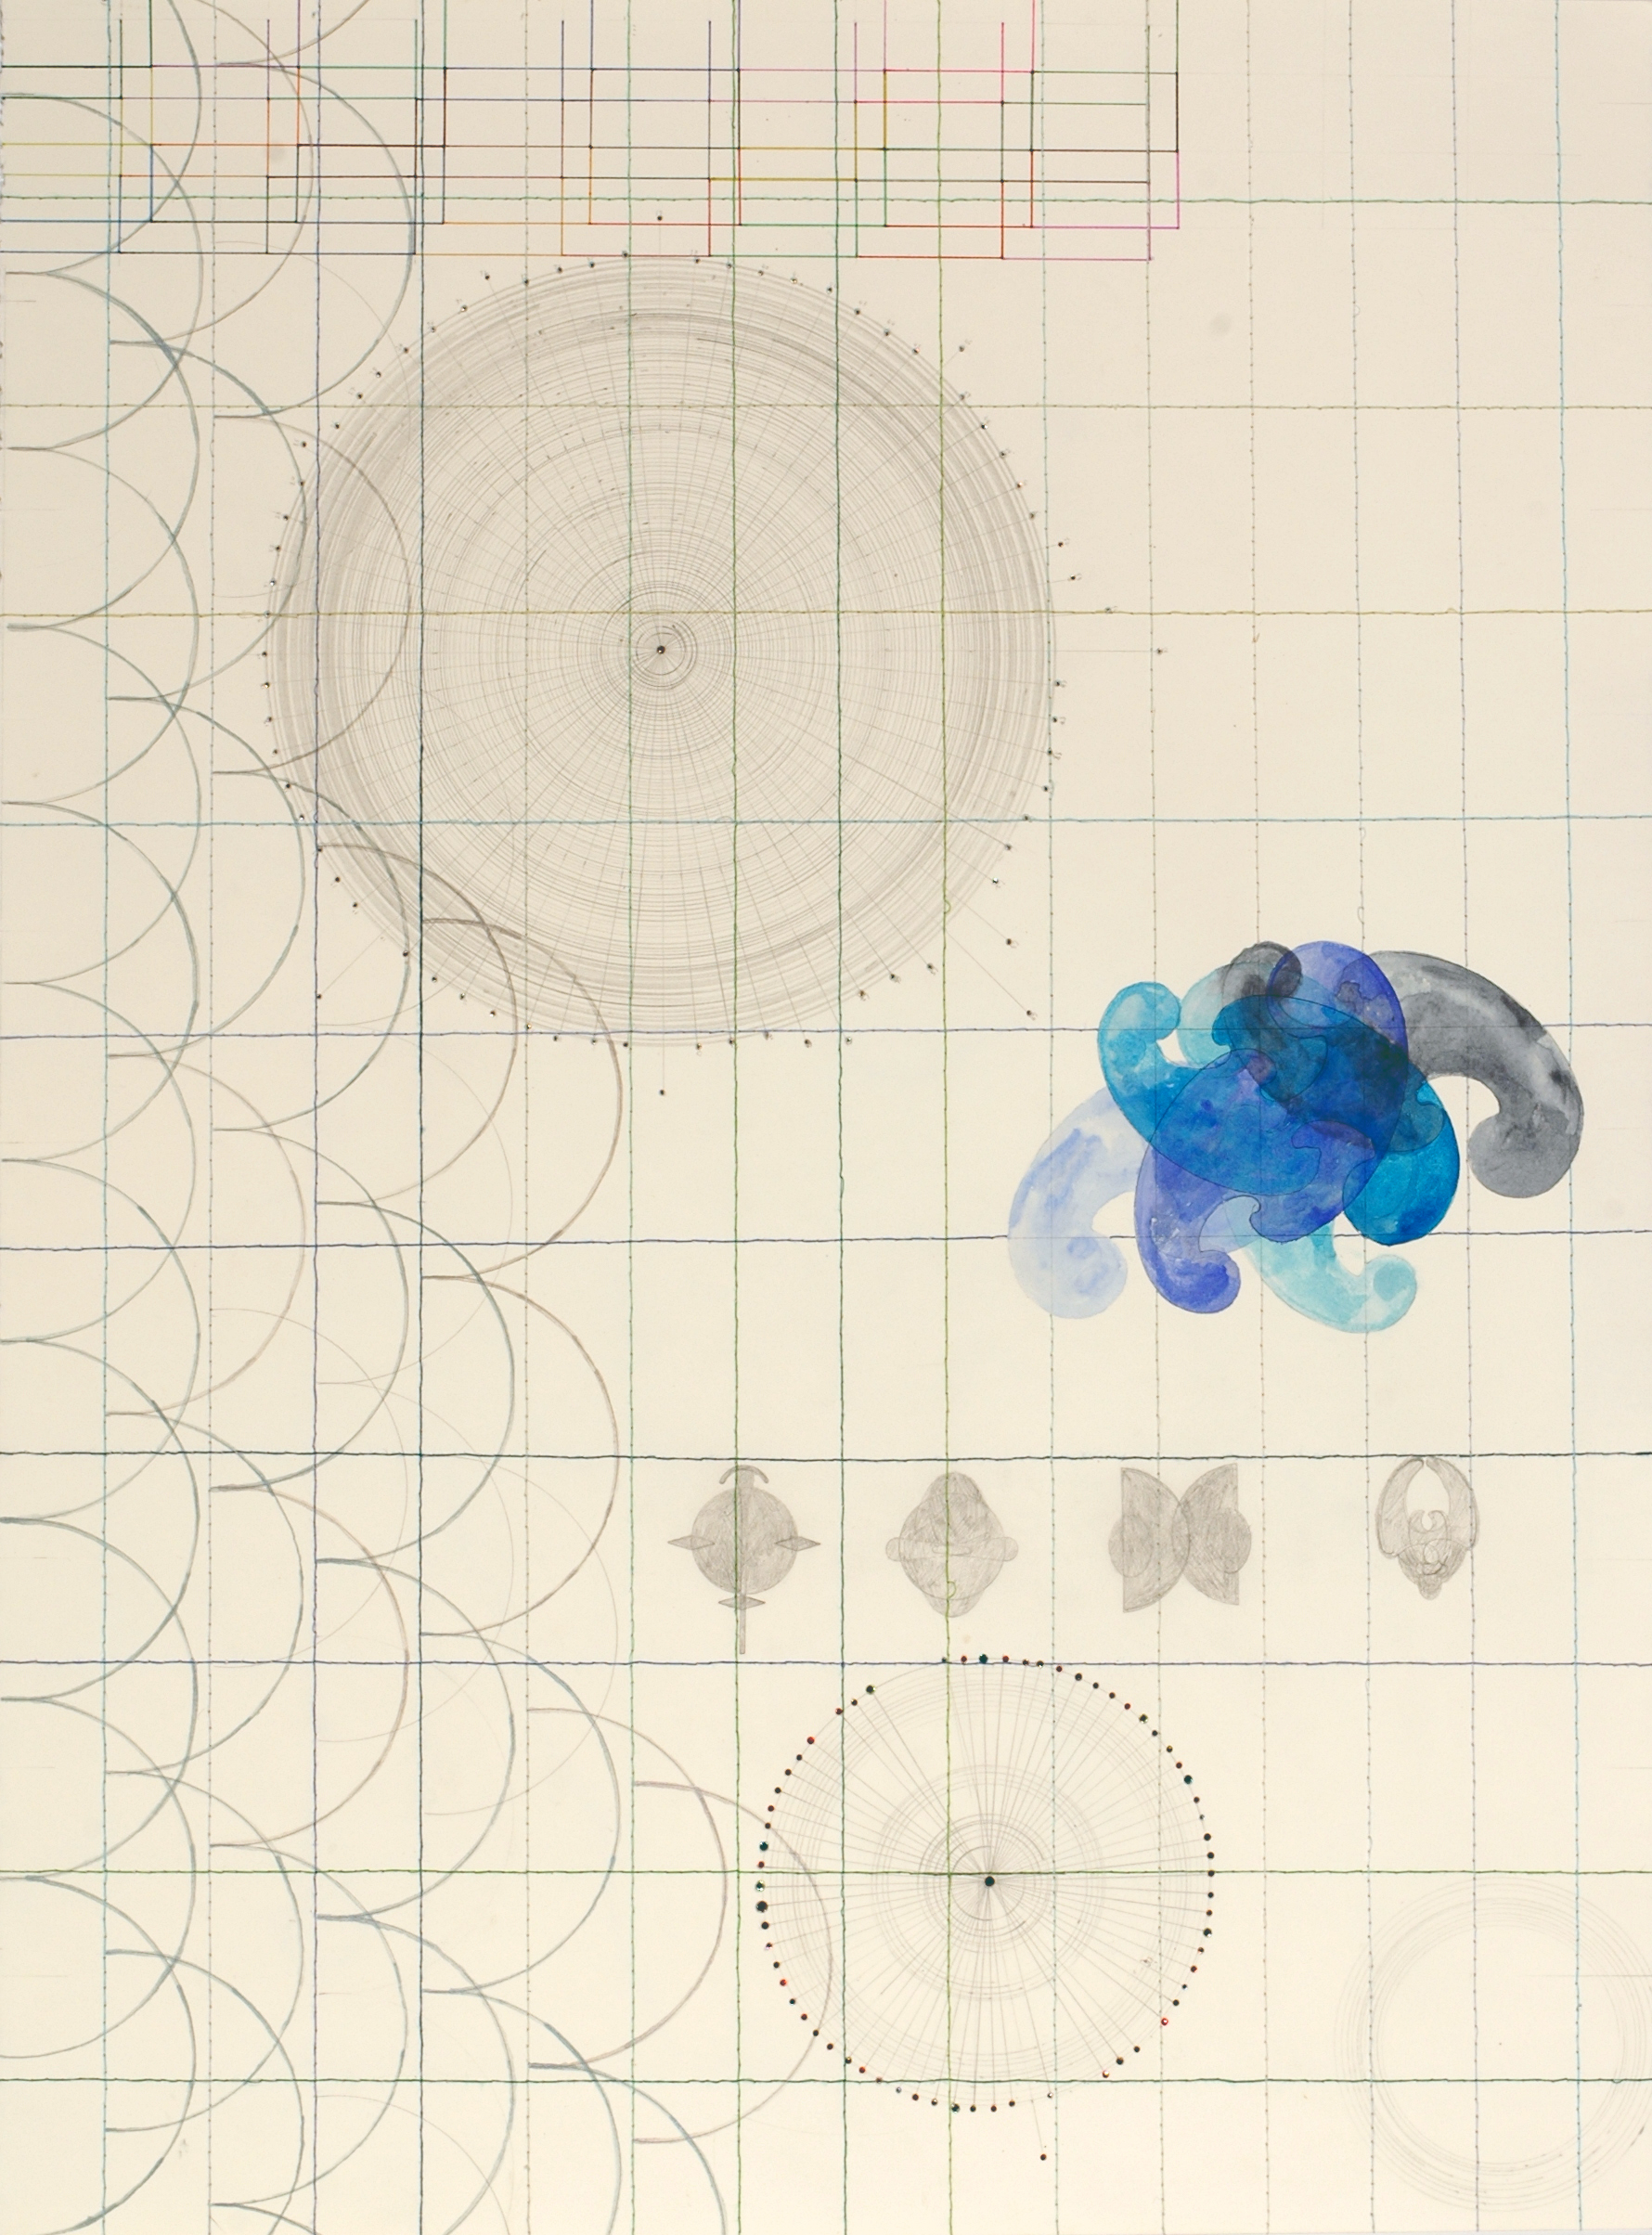 The Melancholic Solitude of Giant Squid (2007)    Japanese Watercolour, Pencil, Polycotton Thread, Cotton Thread, Acrylic, Texta Marker, Swarovski Crystals on Stonehenge Paper    76.5 x 56.5 cm